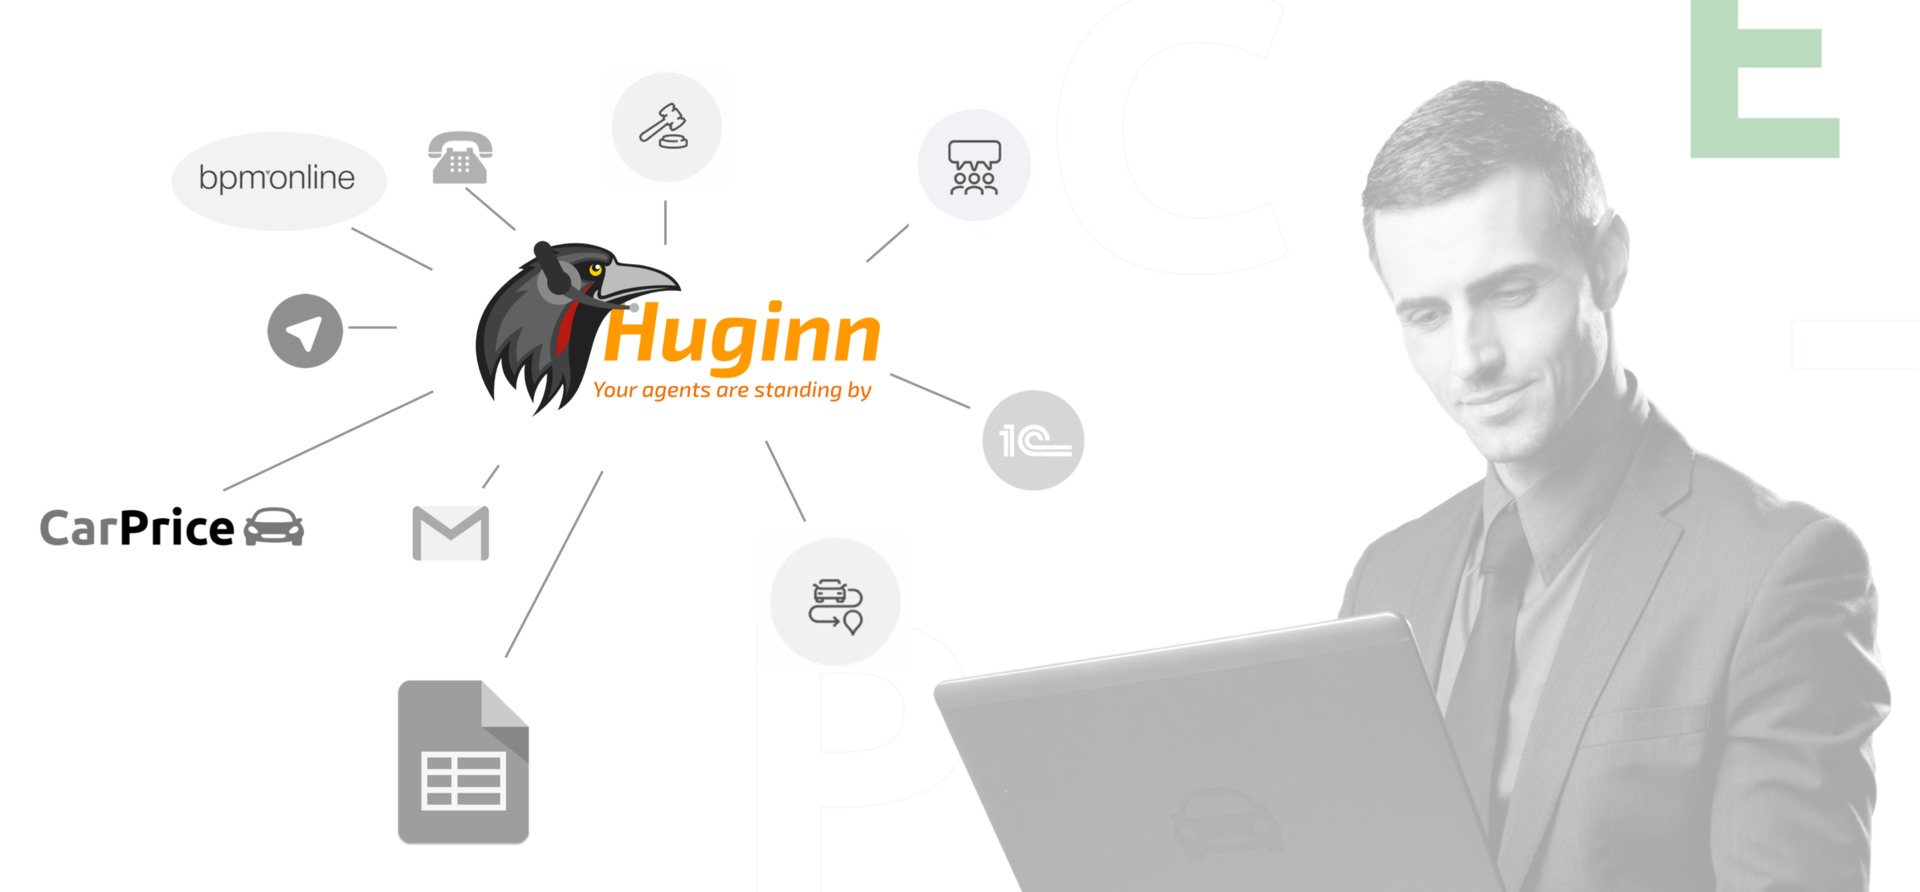 Huginn: простая интеграционная платформа